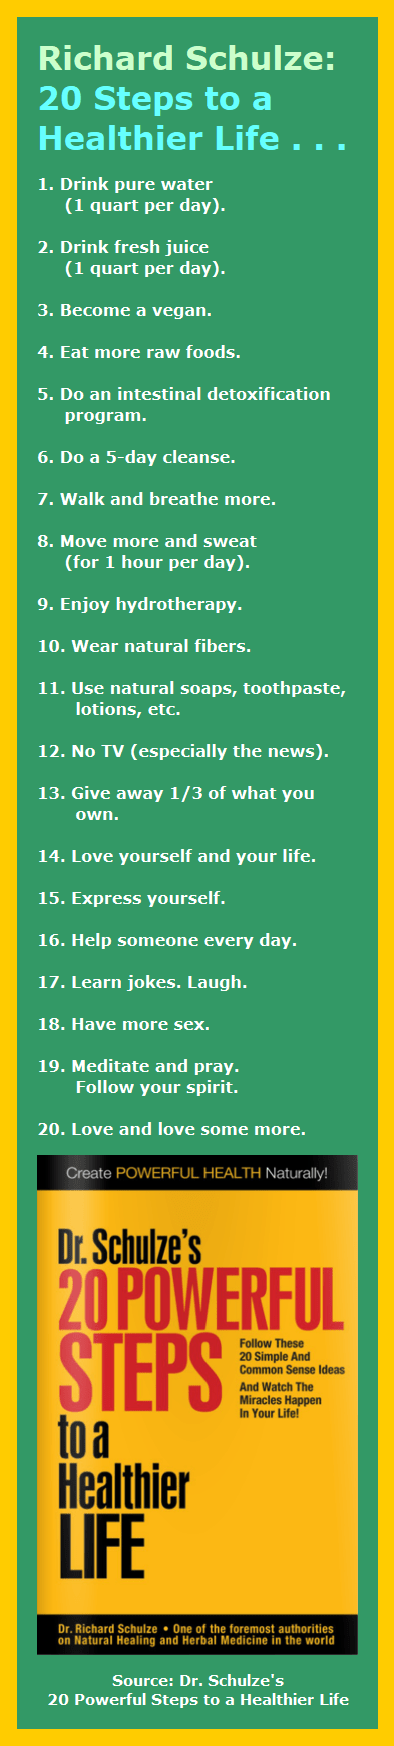 20 Steps to a Healthier You